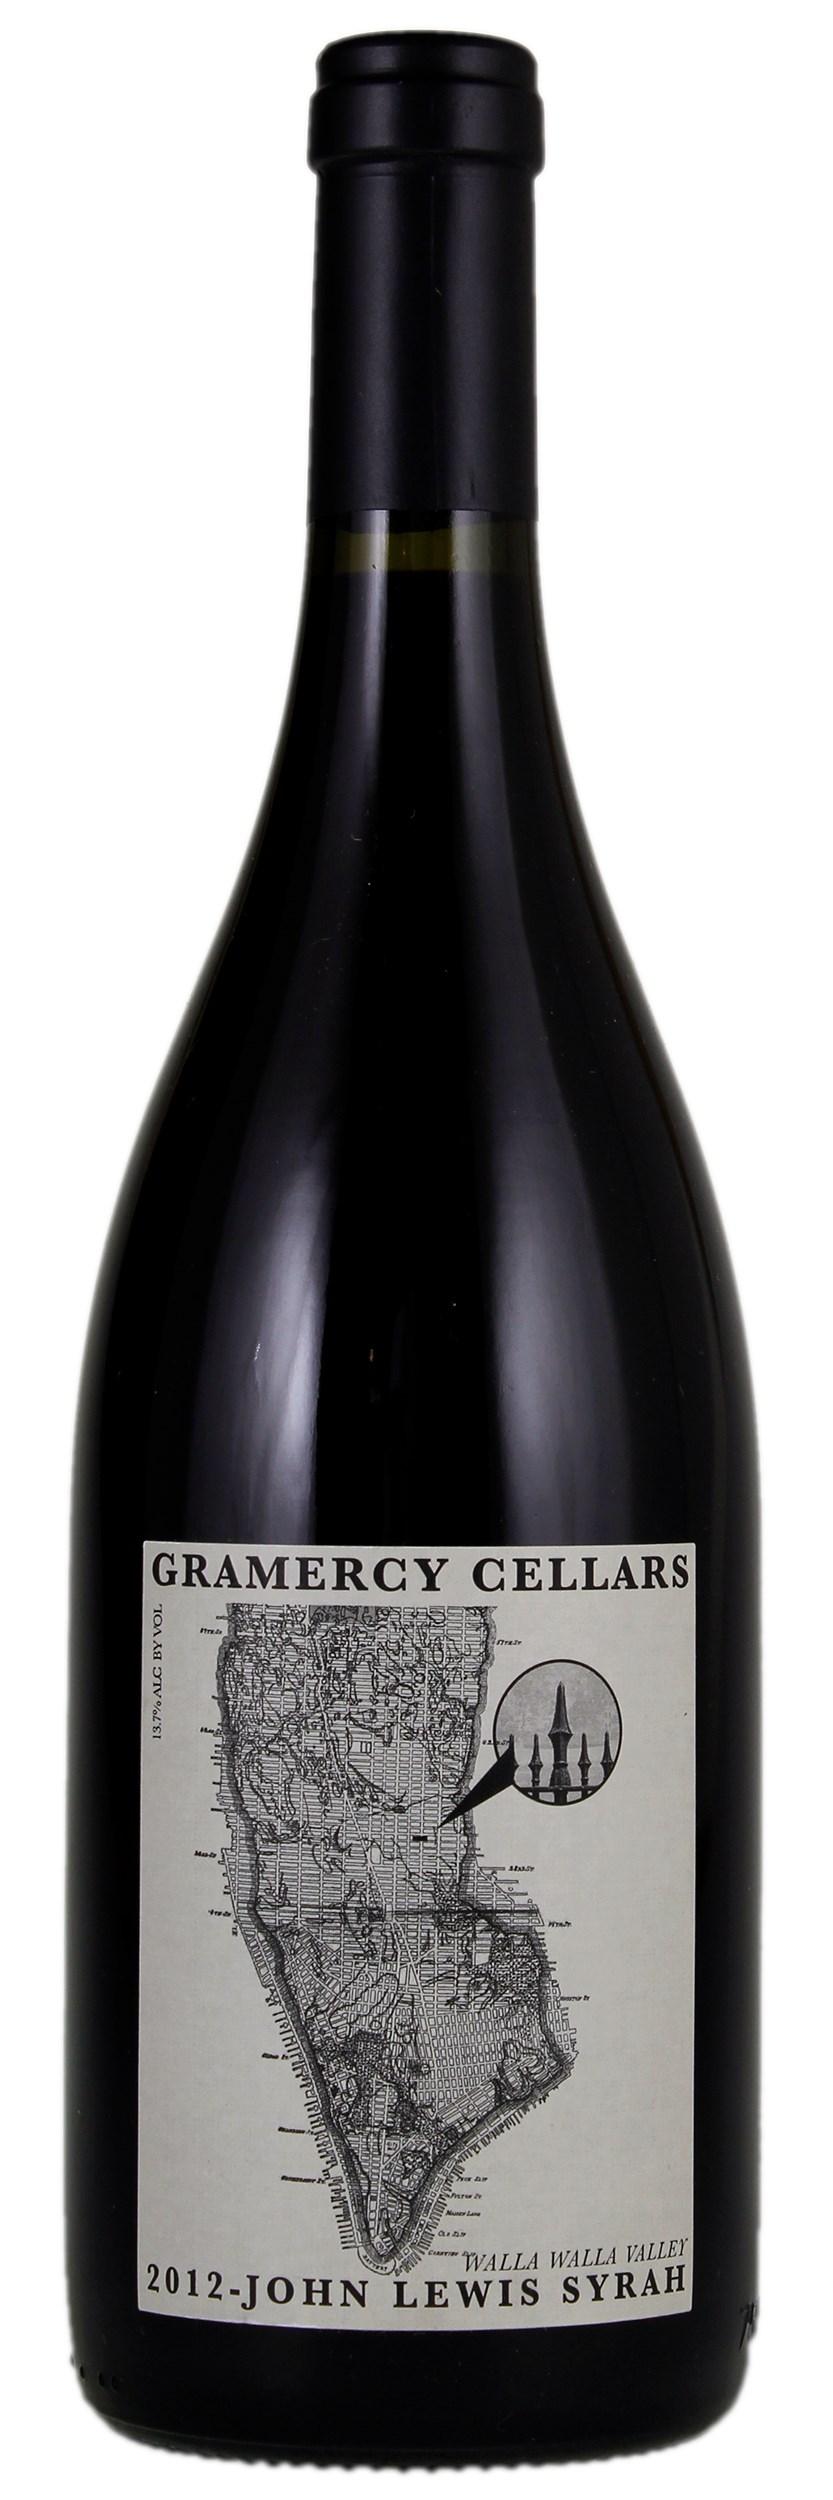 Gramercy Cellars John Lewis Syrah 2012, Red Wine from United